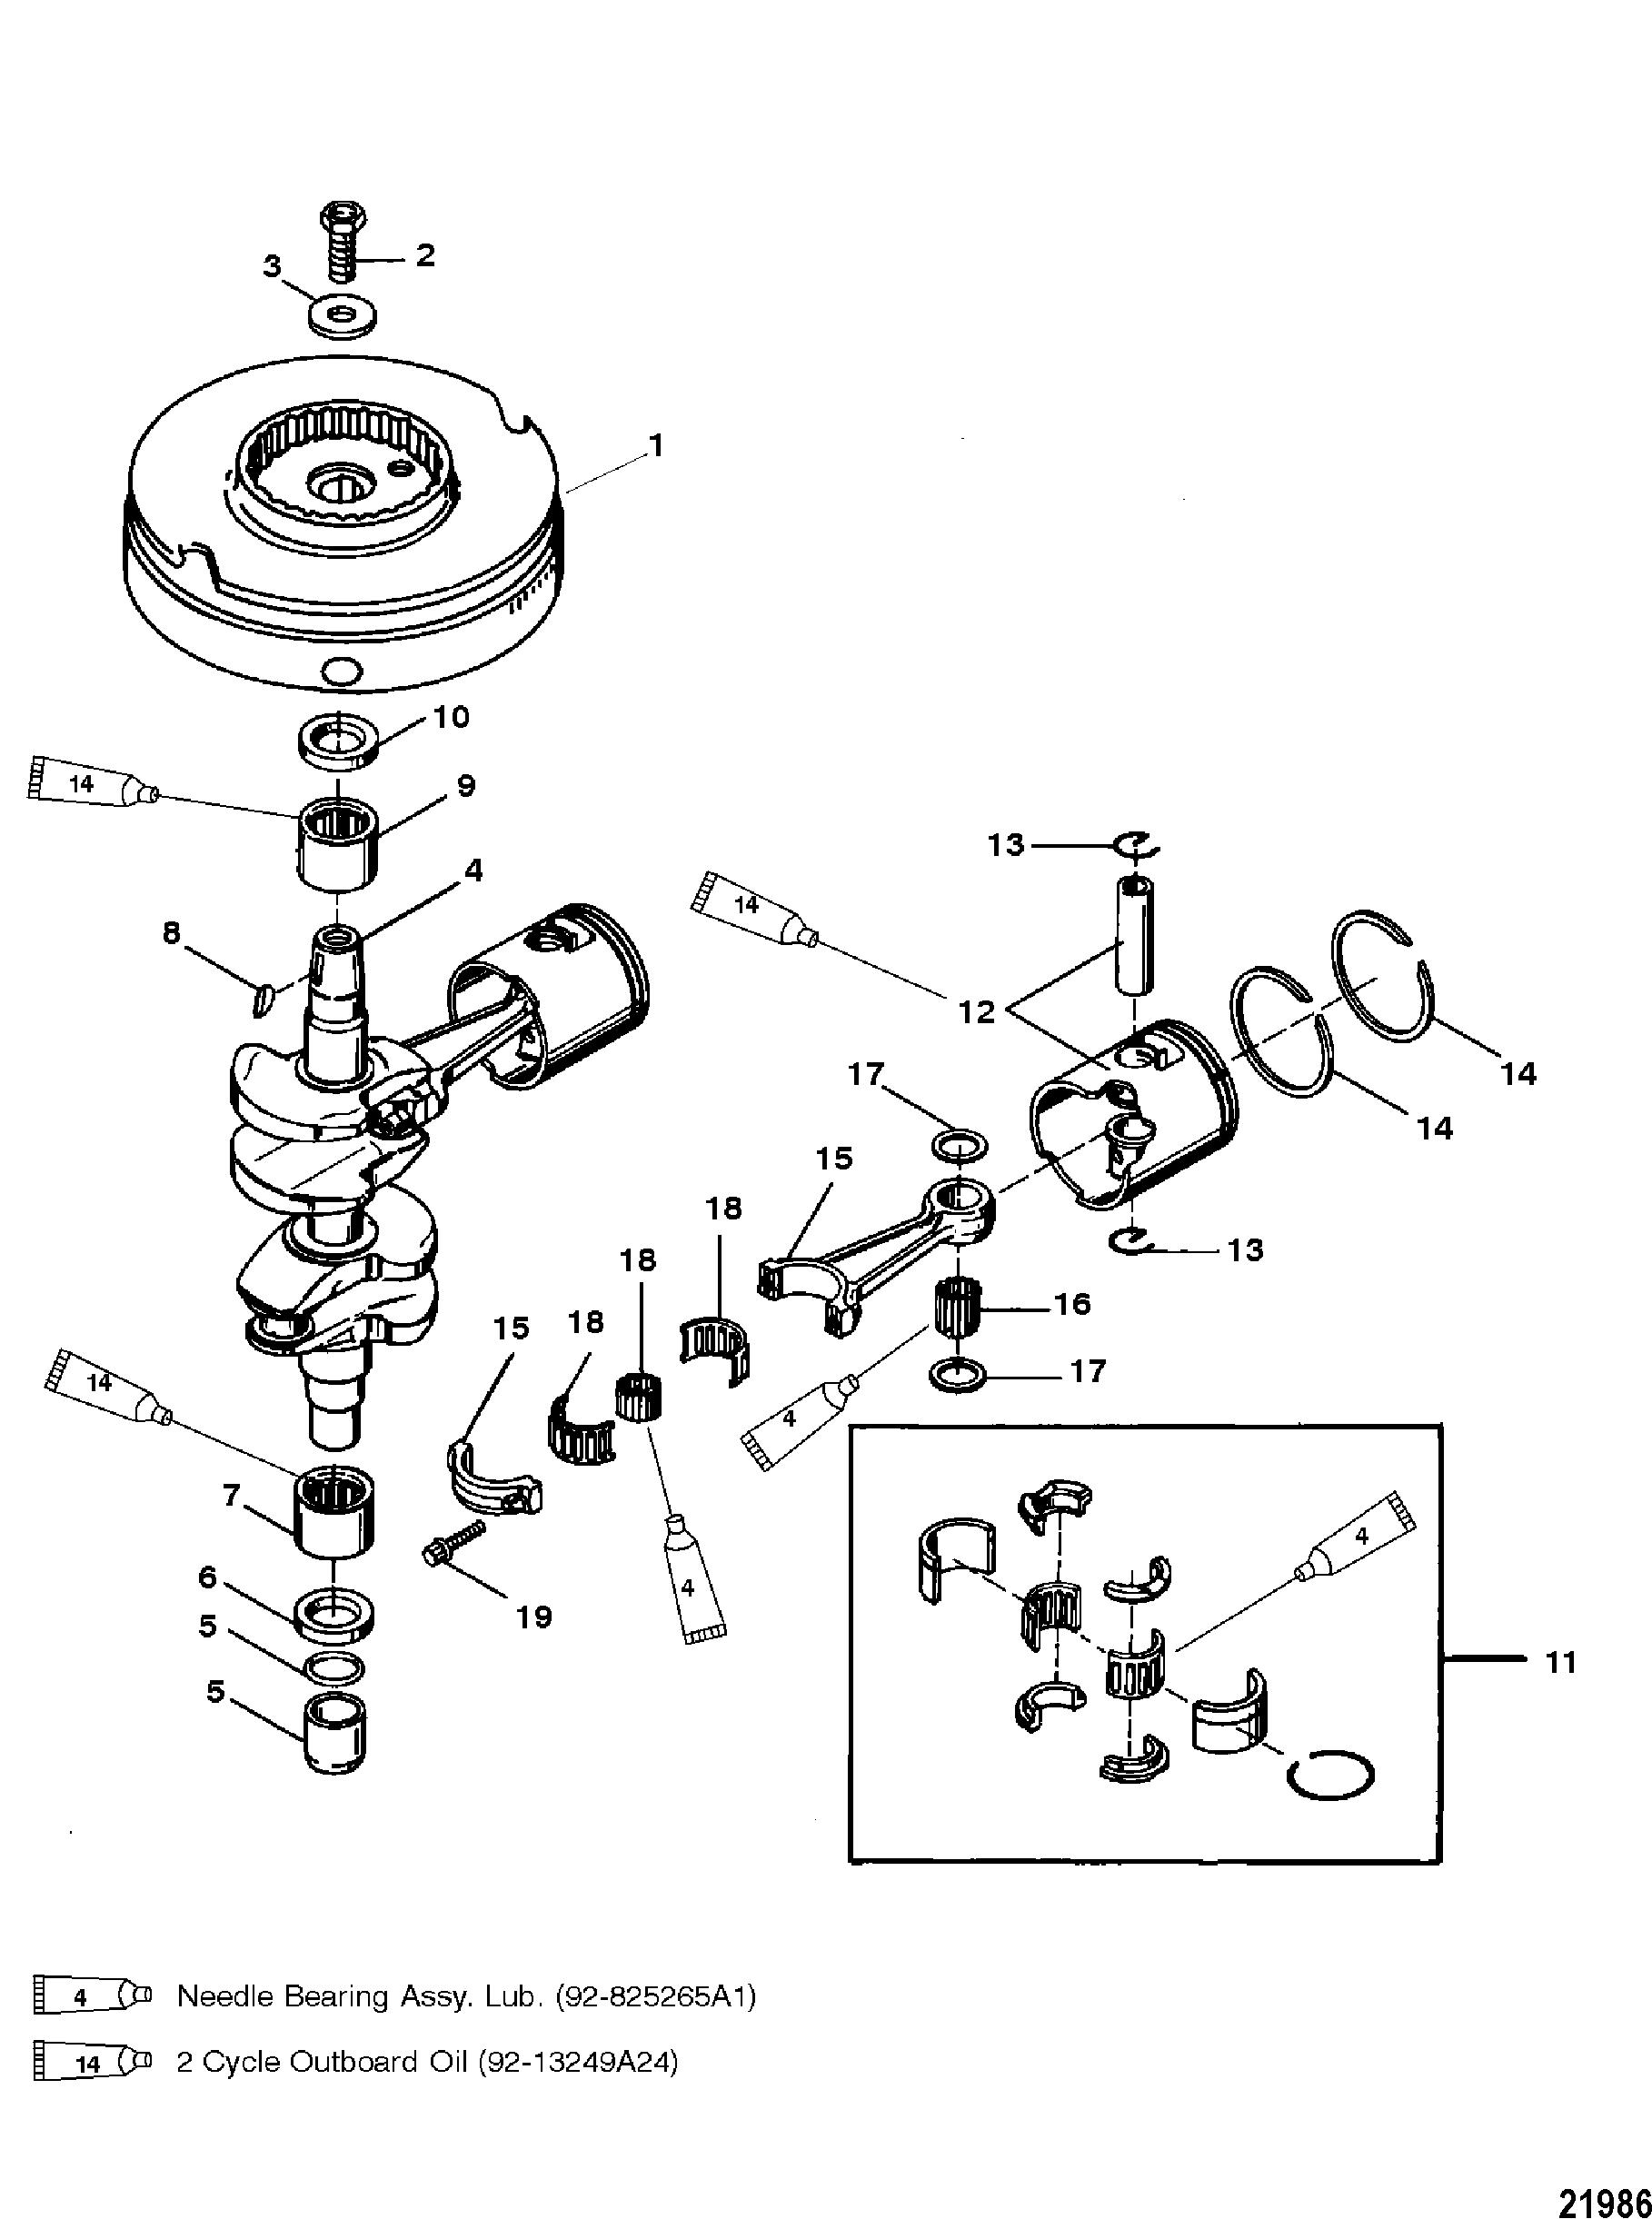 Crankshaft Pistons And Flywheel For Mariner Mercury Sea